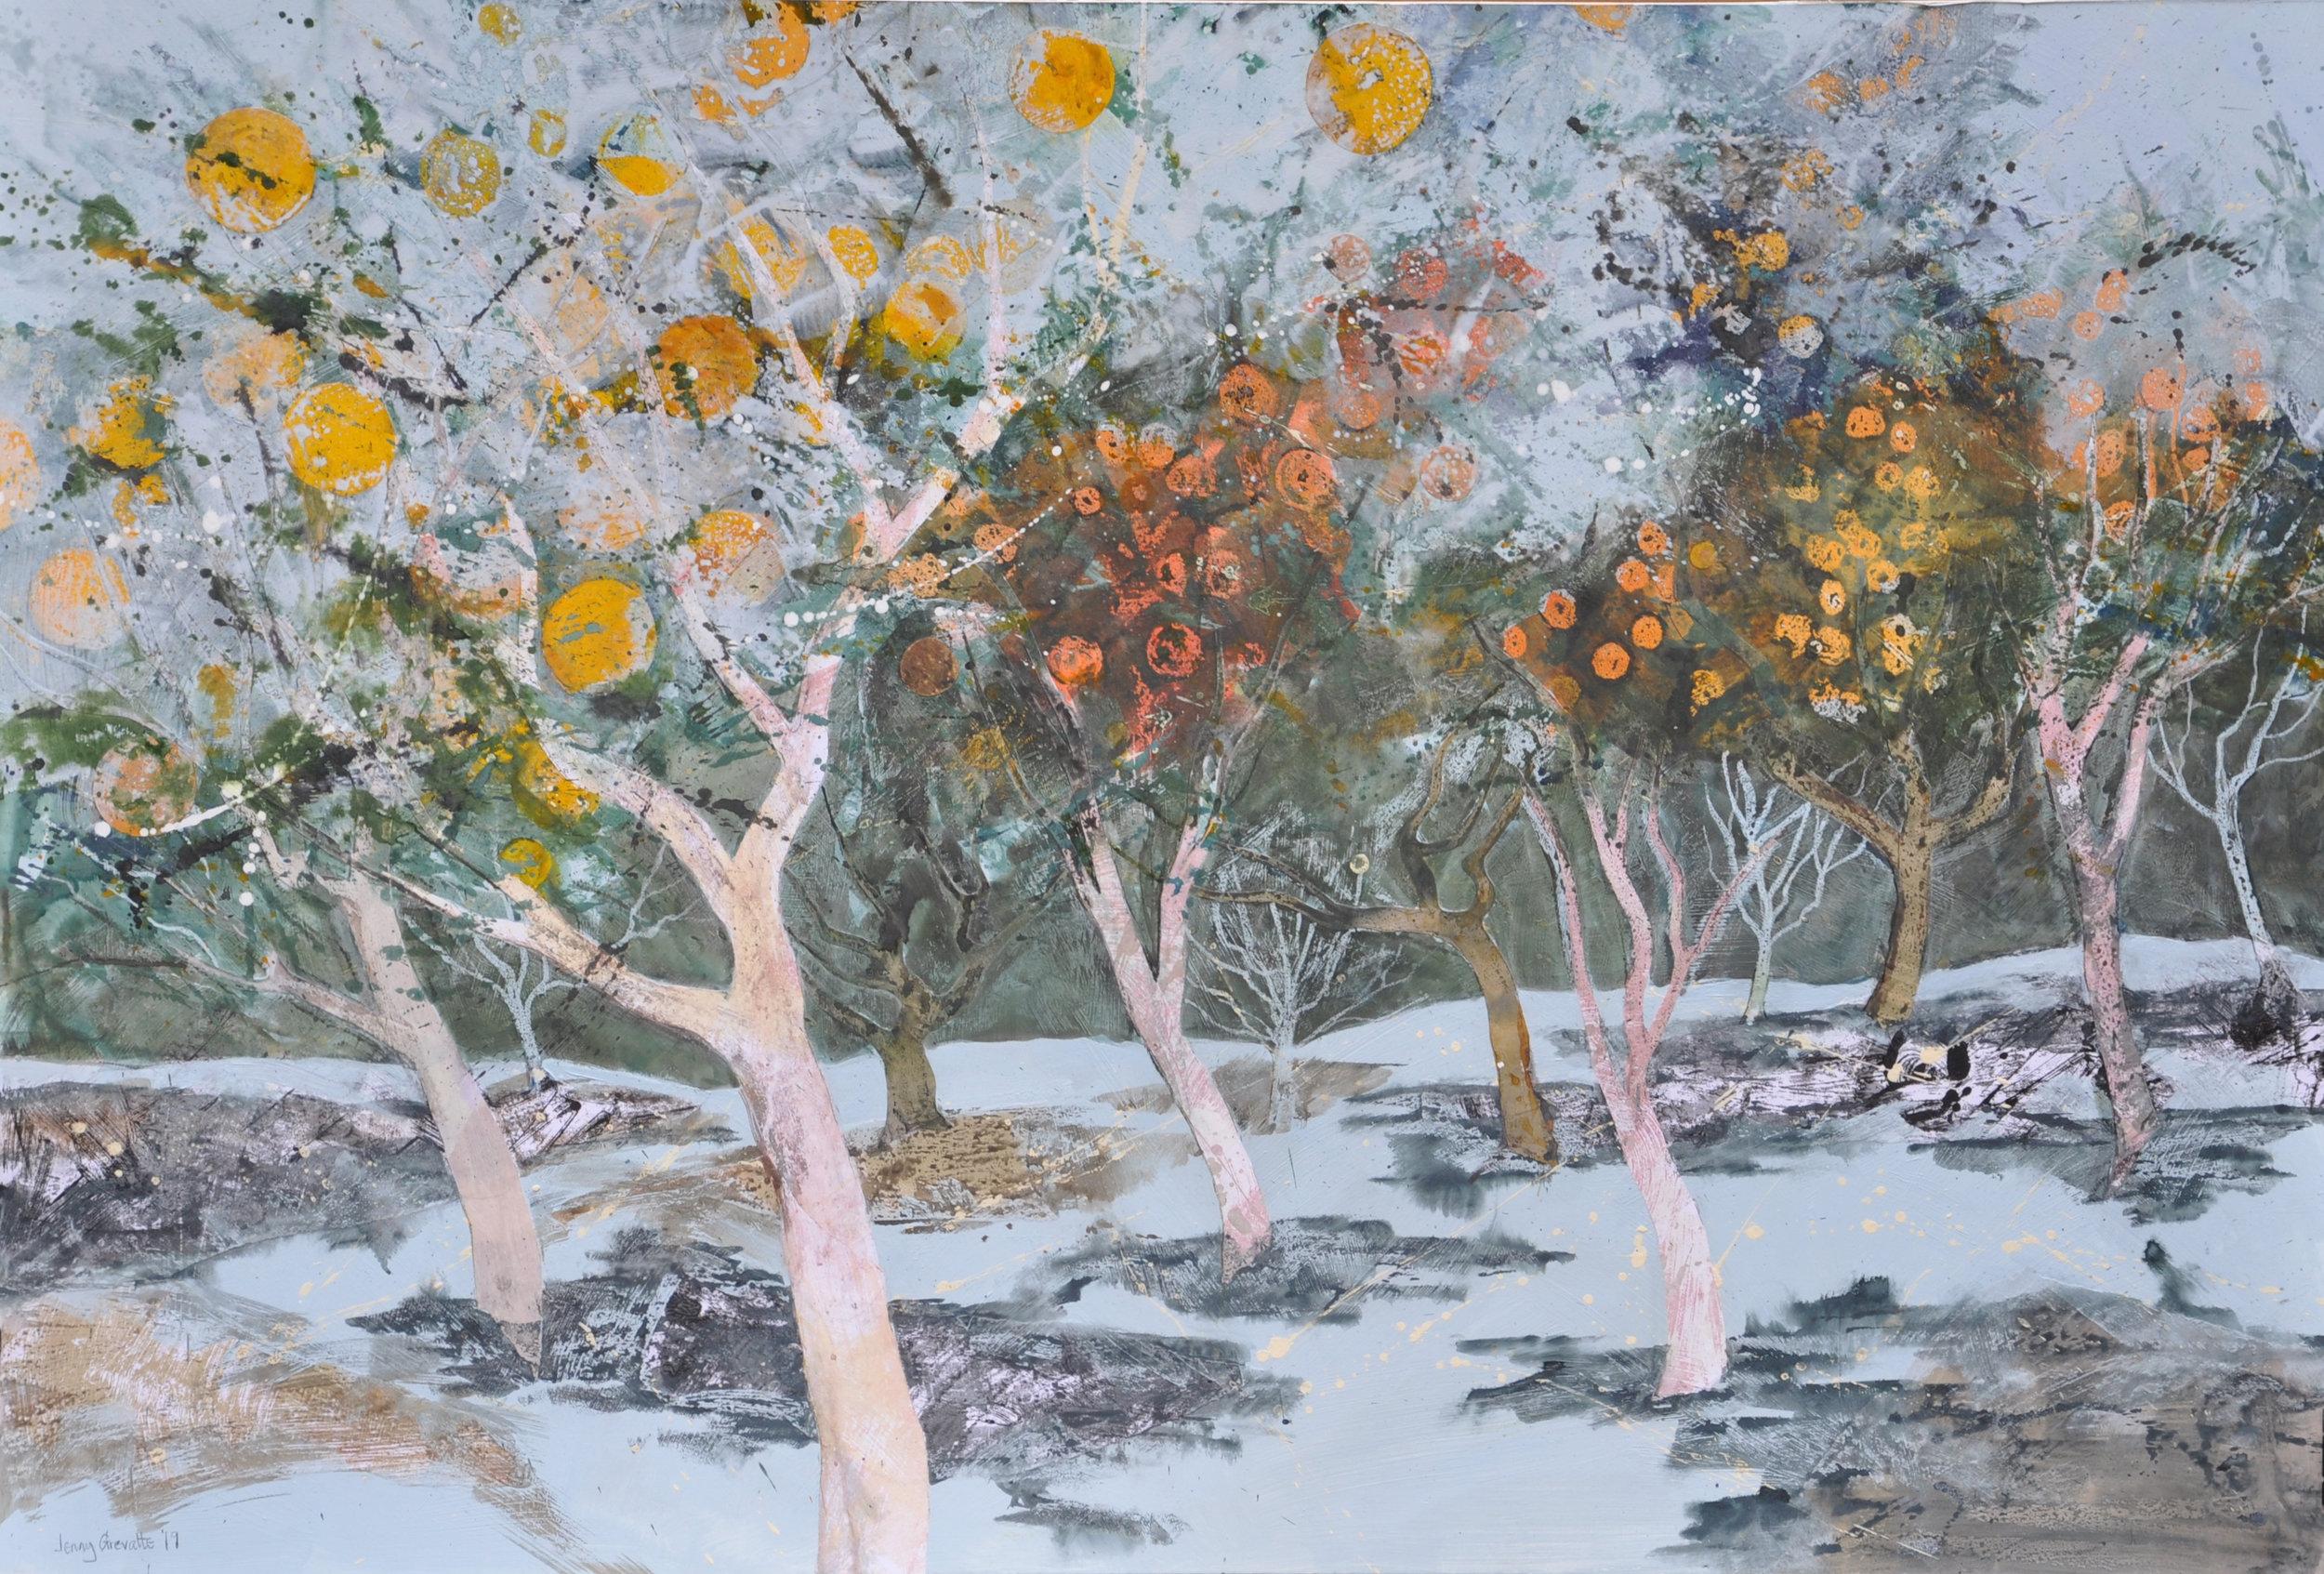 In amongst the orange trees, Crete